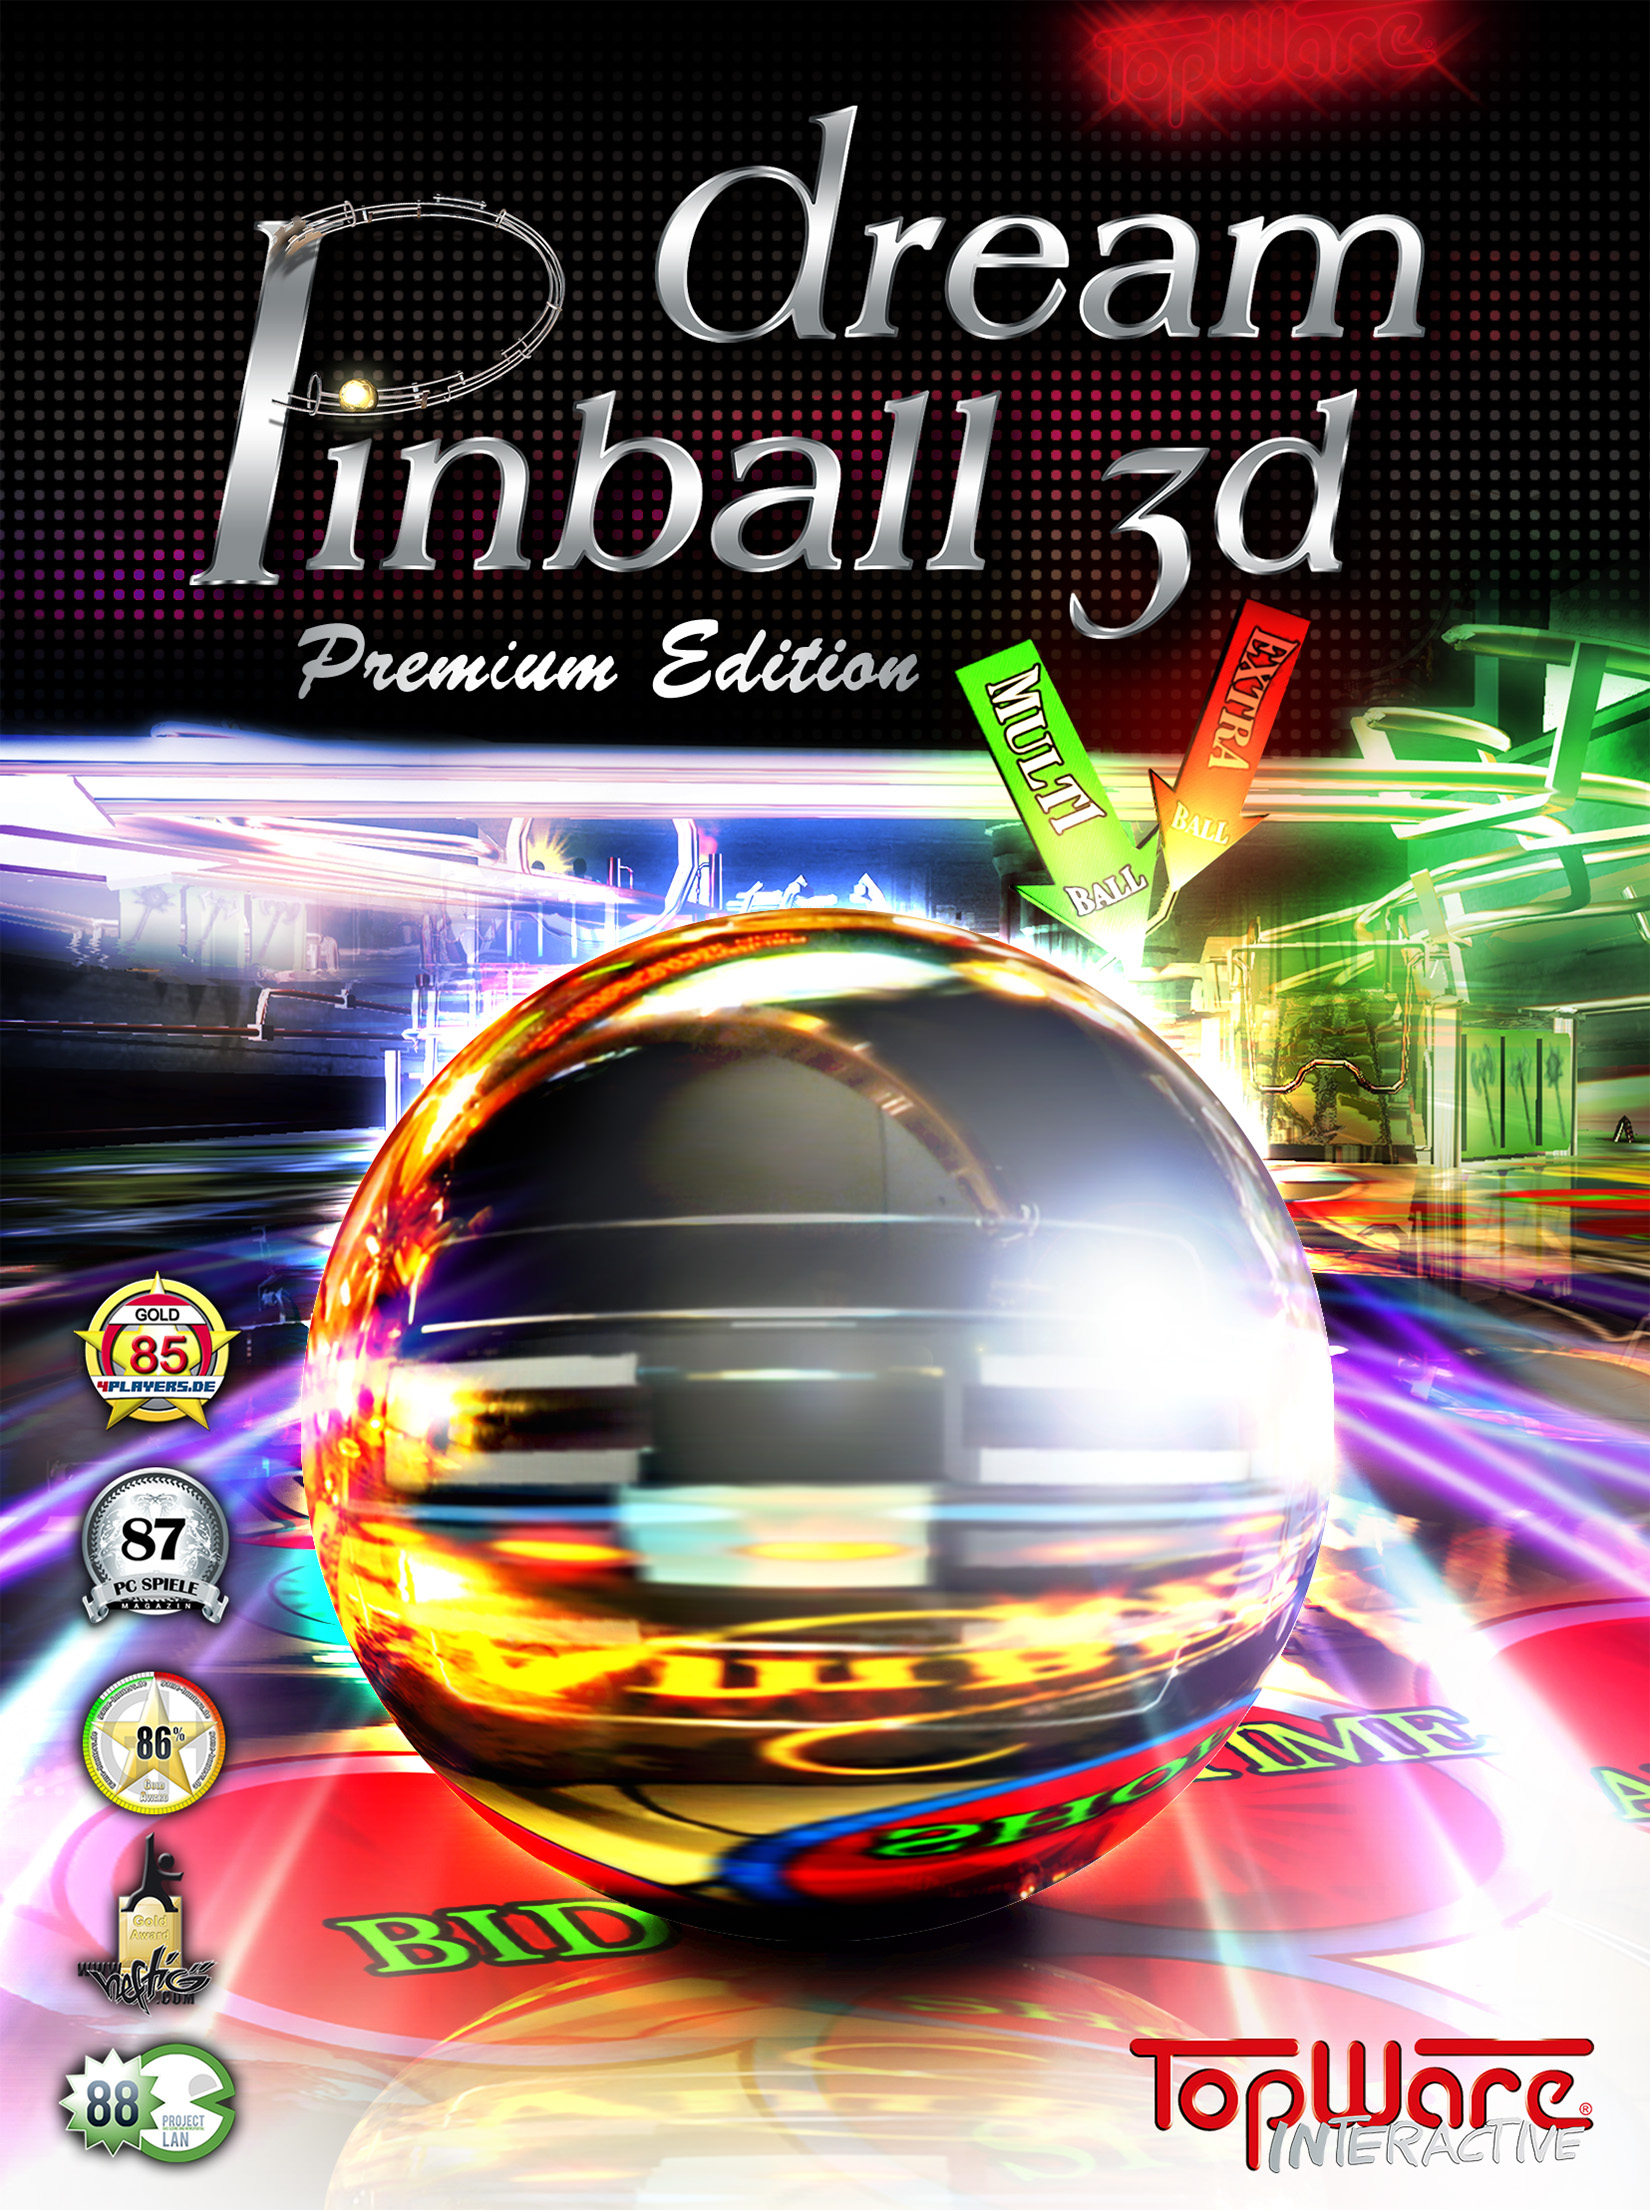 Dream Pinball 3D Windows Mac Wii DS game  Mod DB